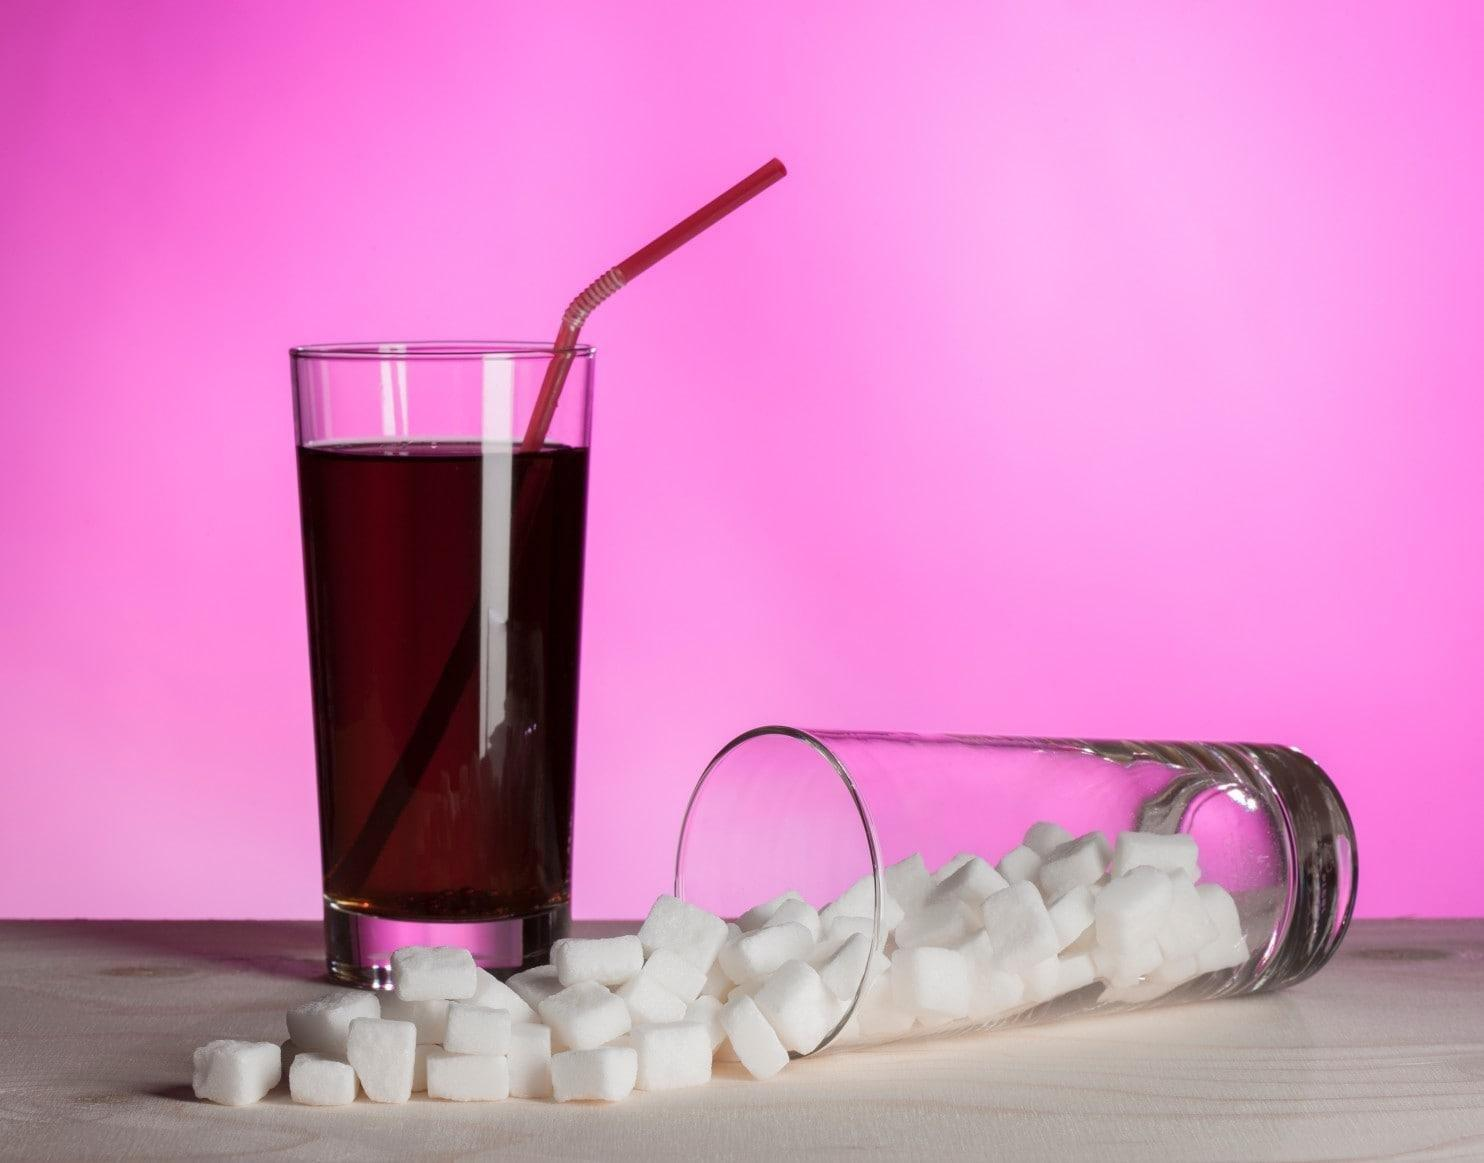 Sugary Drinks May Raise Diabetes Risk